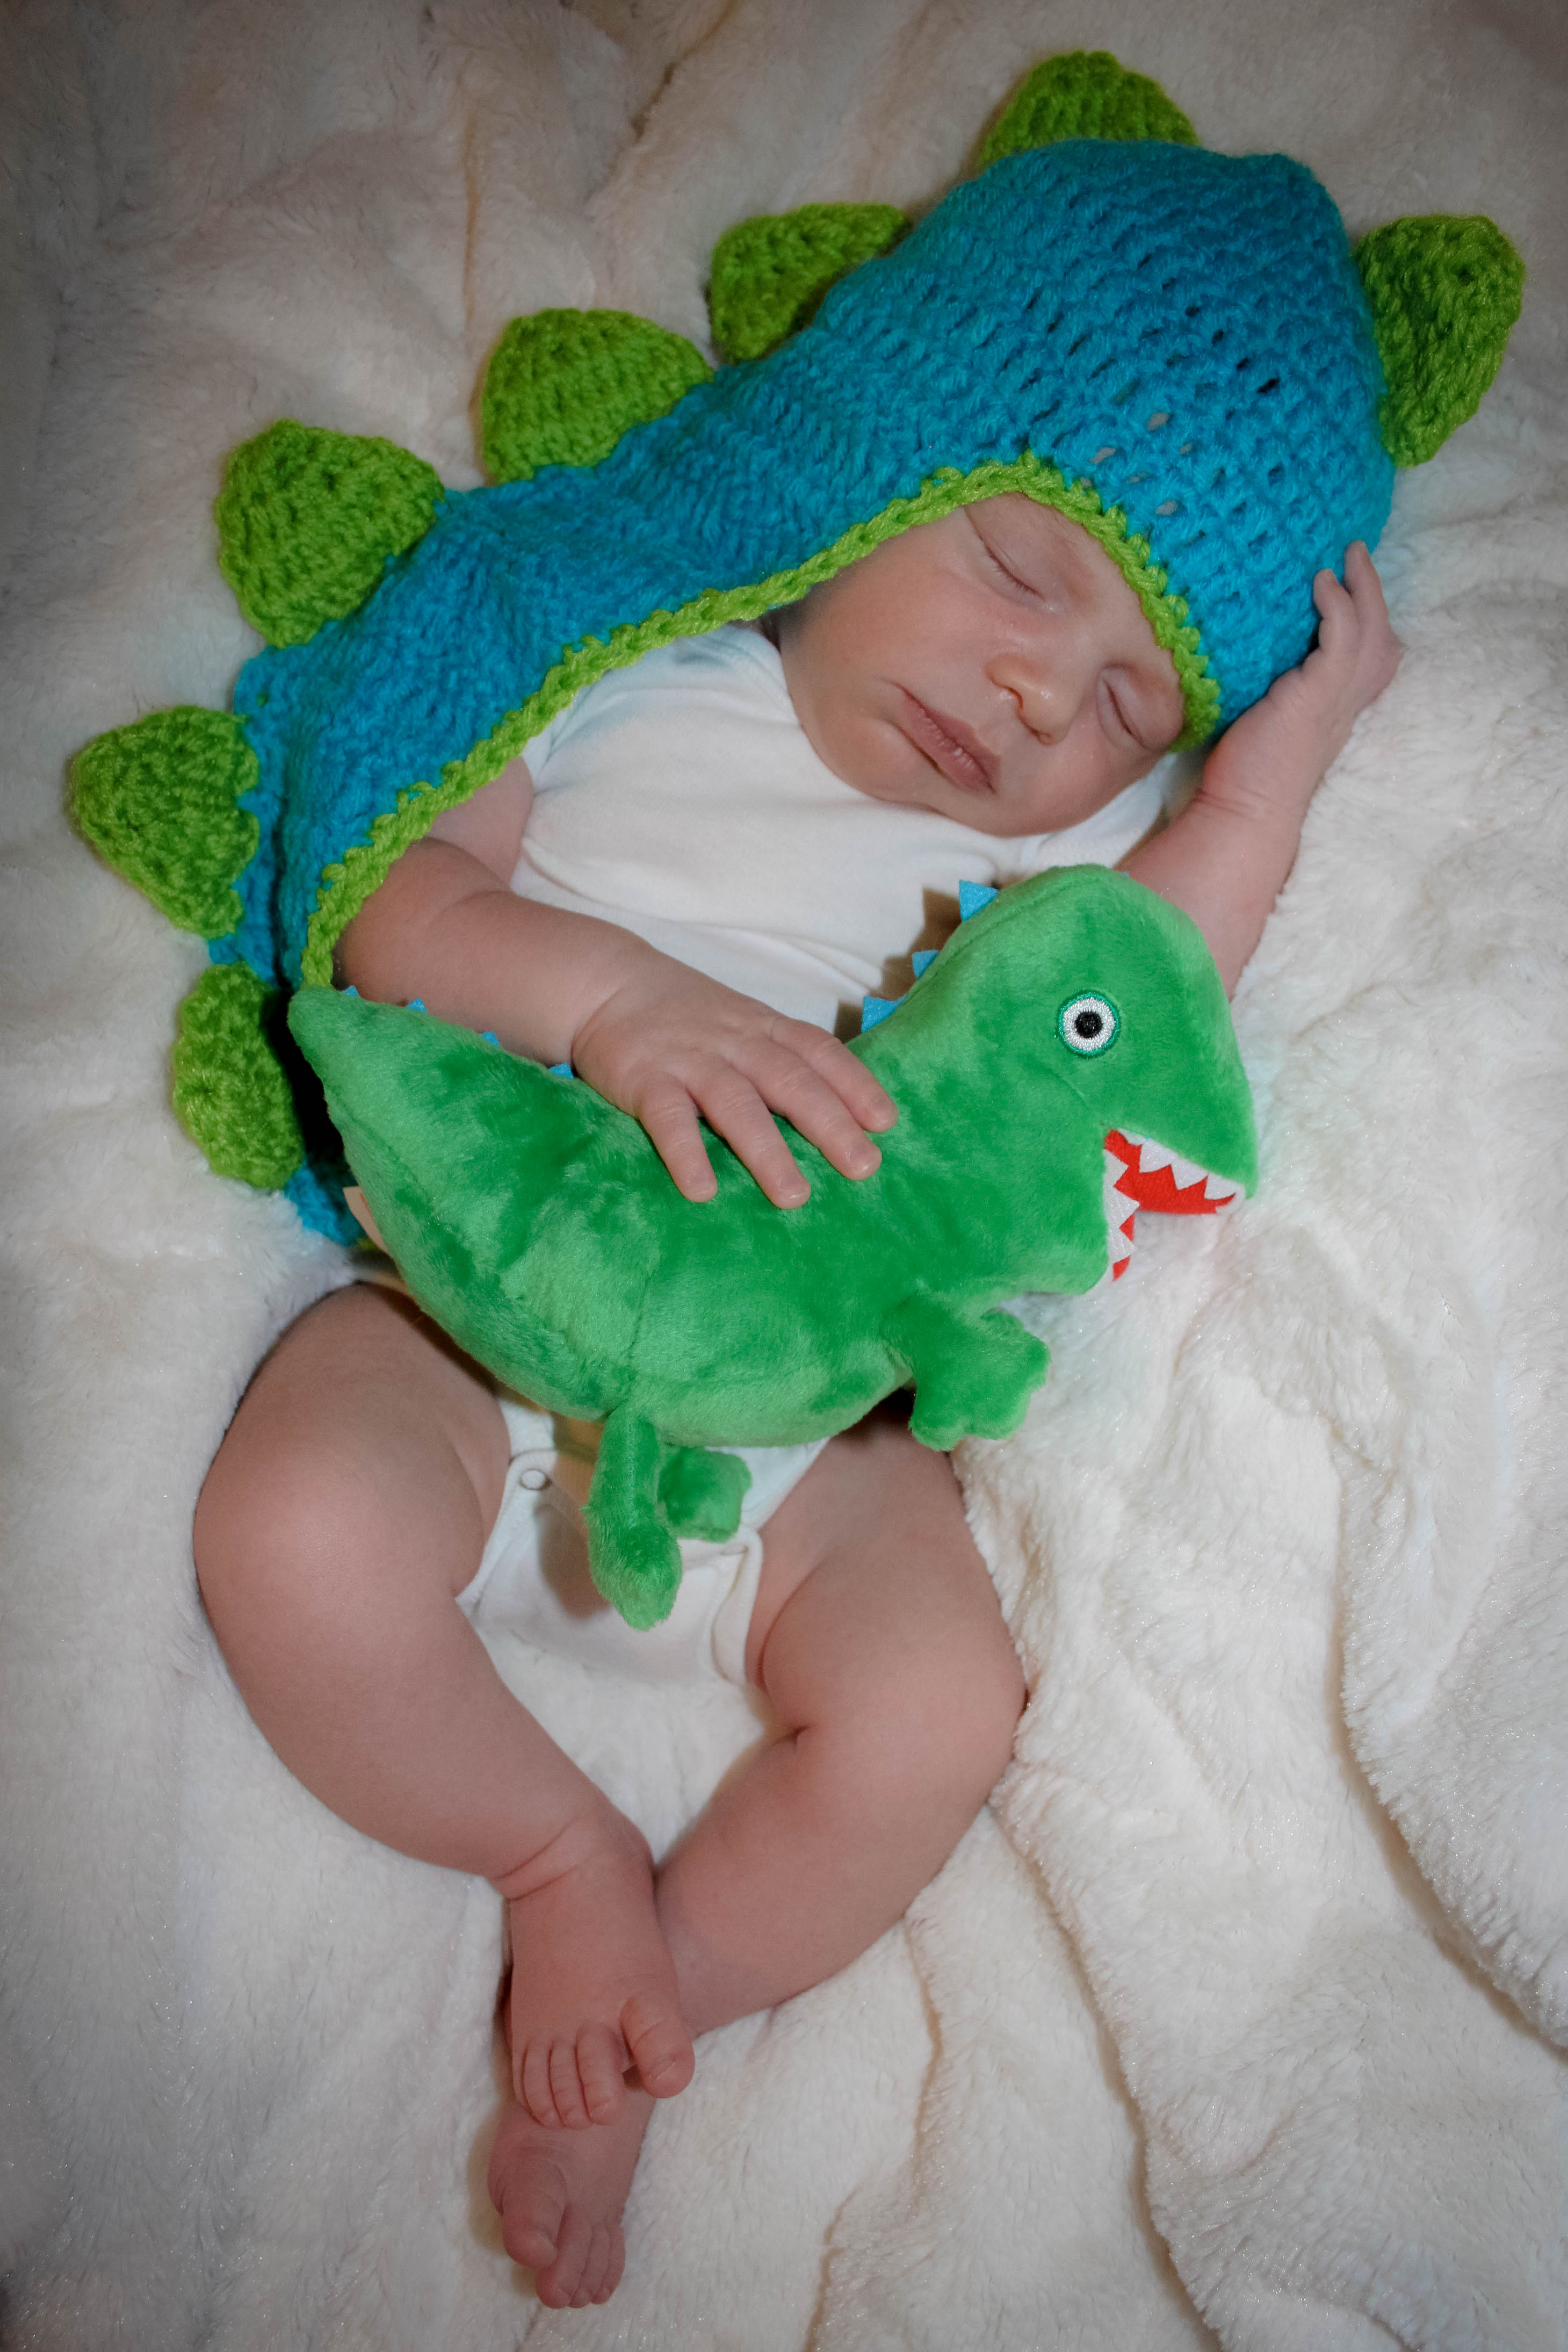 newborn, baby, infant